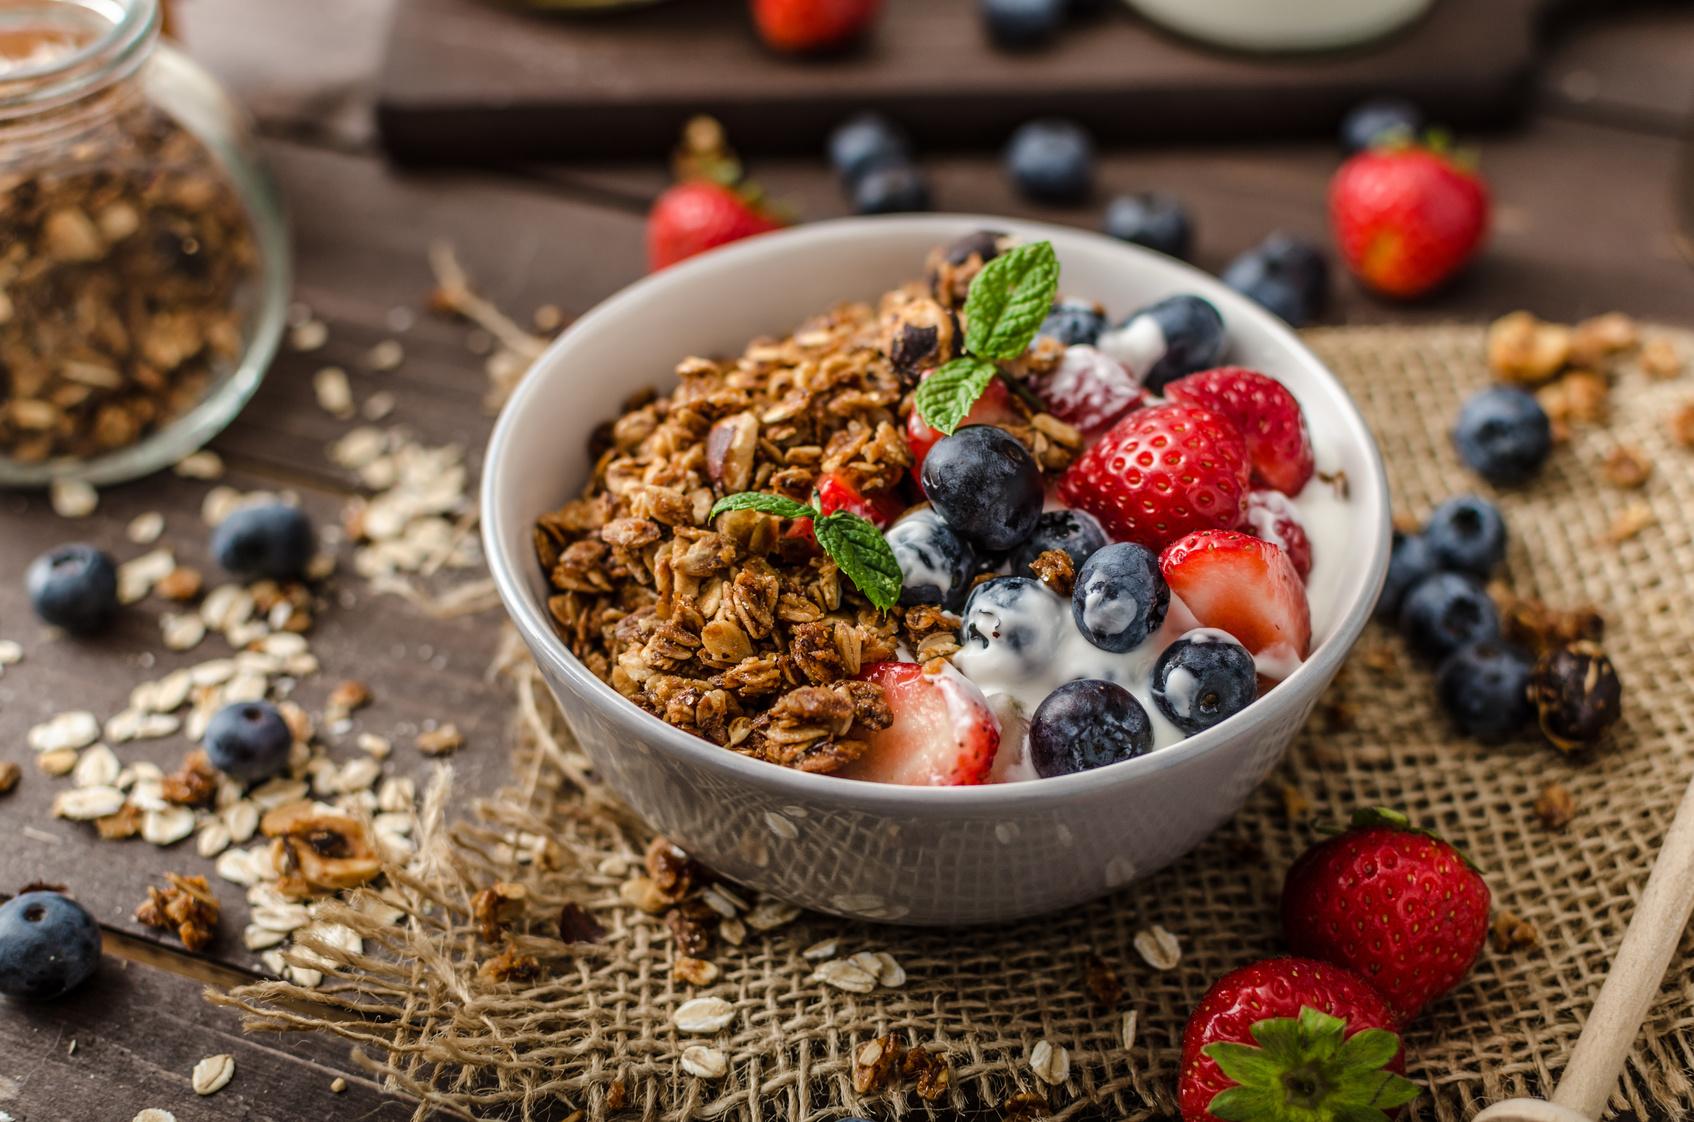 goodblog mit der TCM-Ernährungsberatung Apfelbaum: Warmes Frühstück - selbstgemachtes Schokomüsli (c) Peteers/fotolia